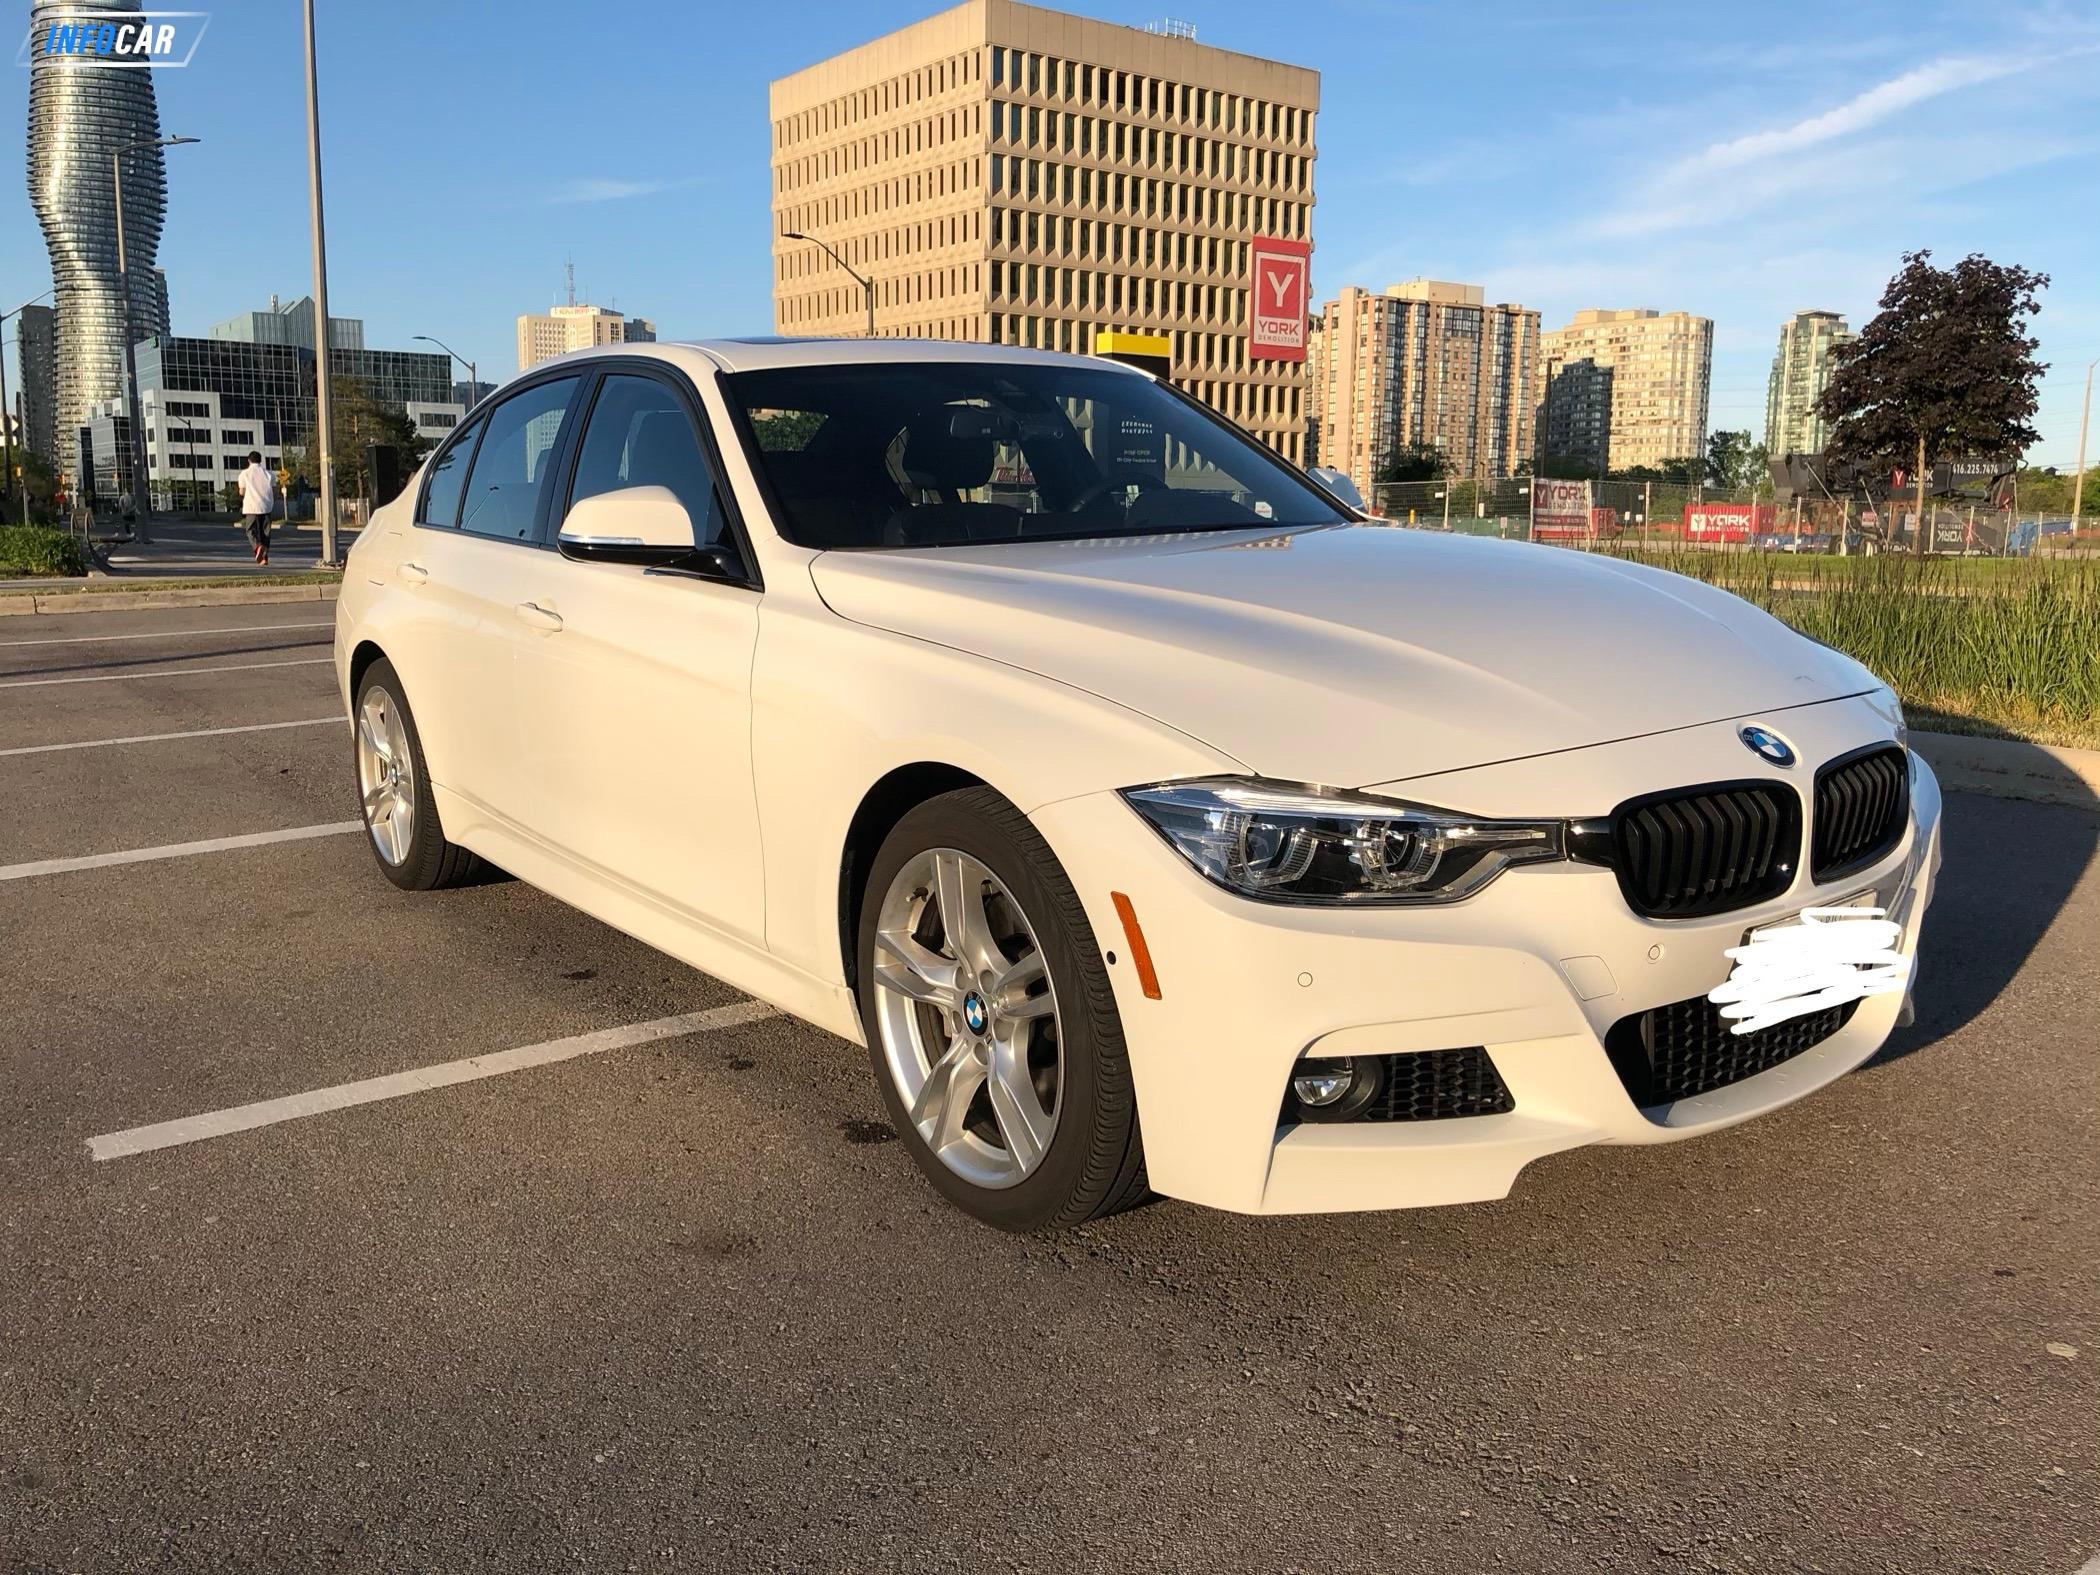 2018 BMW 3-Series 340i - INFOCAR - Toronto's Most Comprehensive New and Used Auto Trading Platform